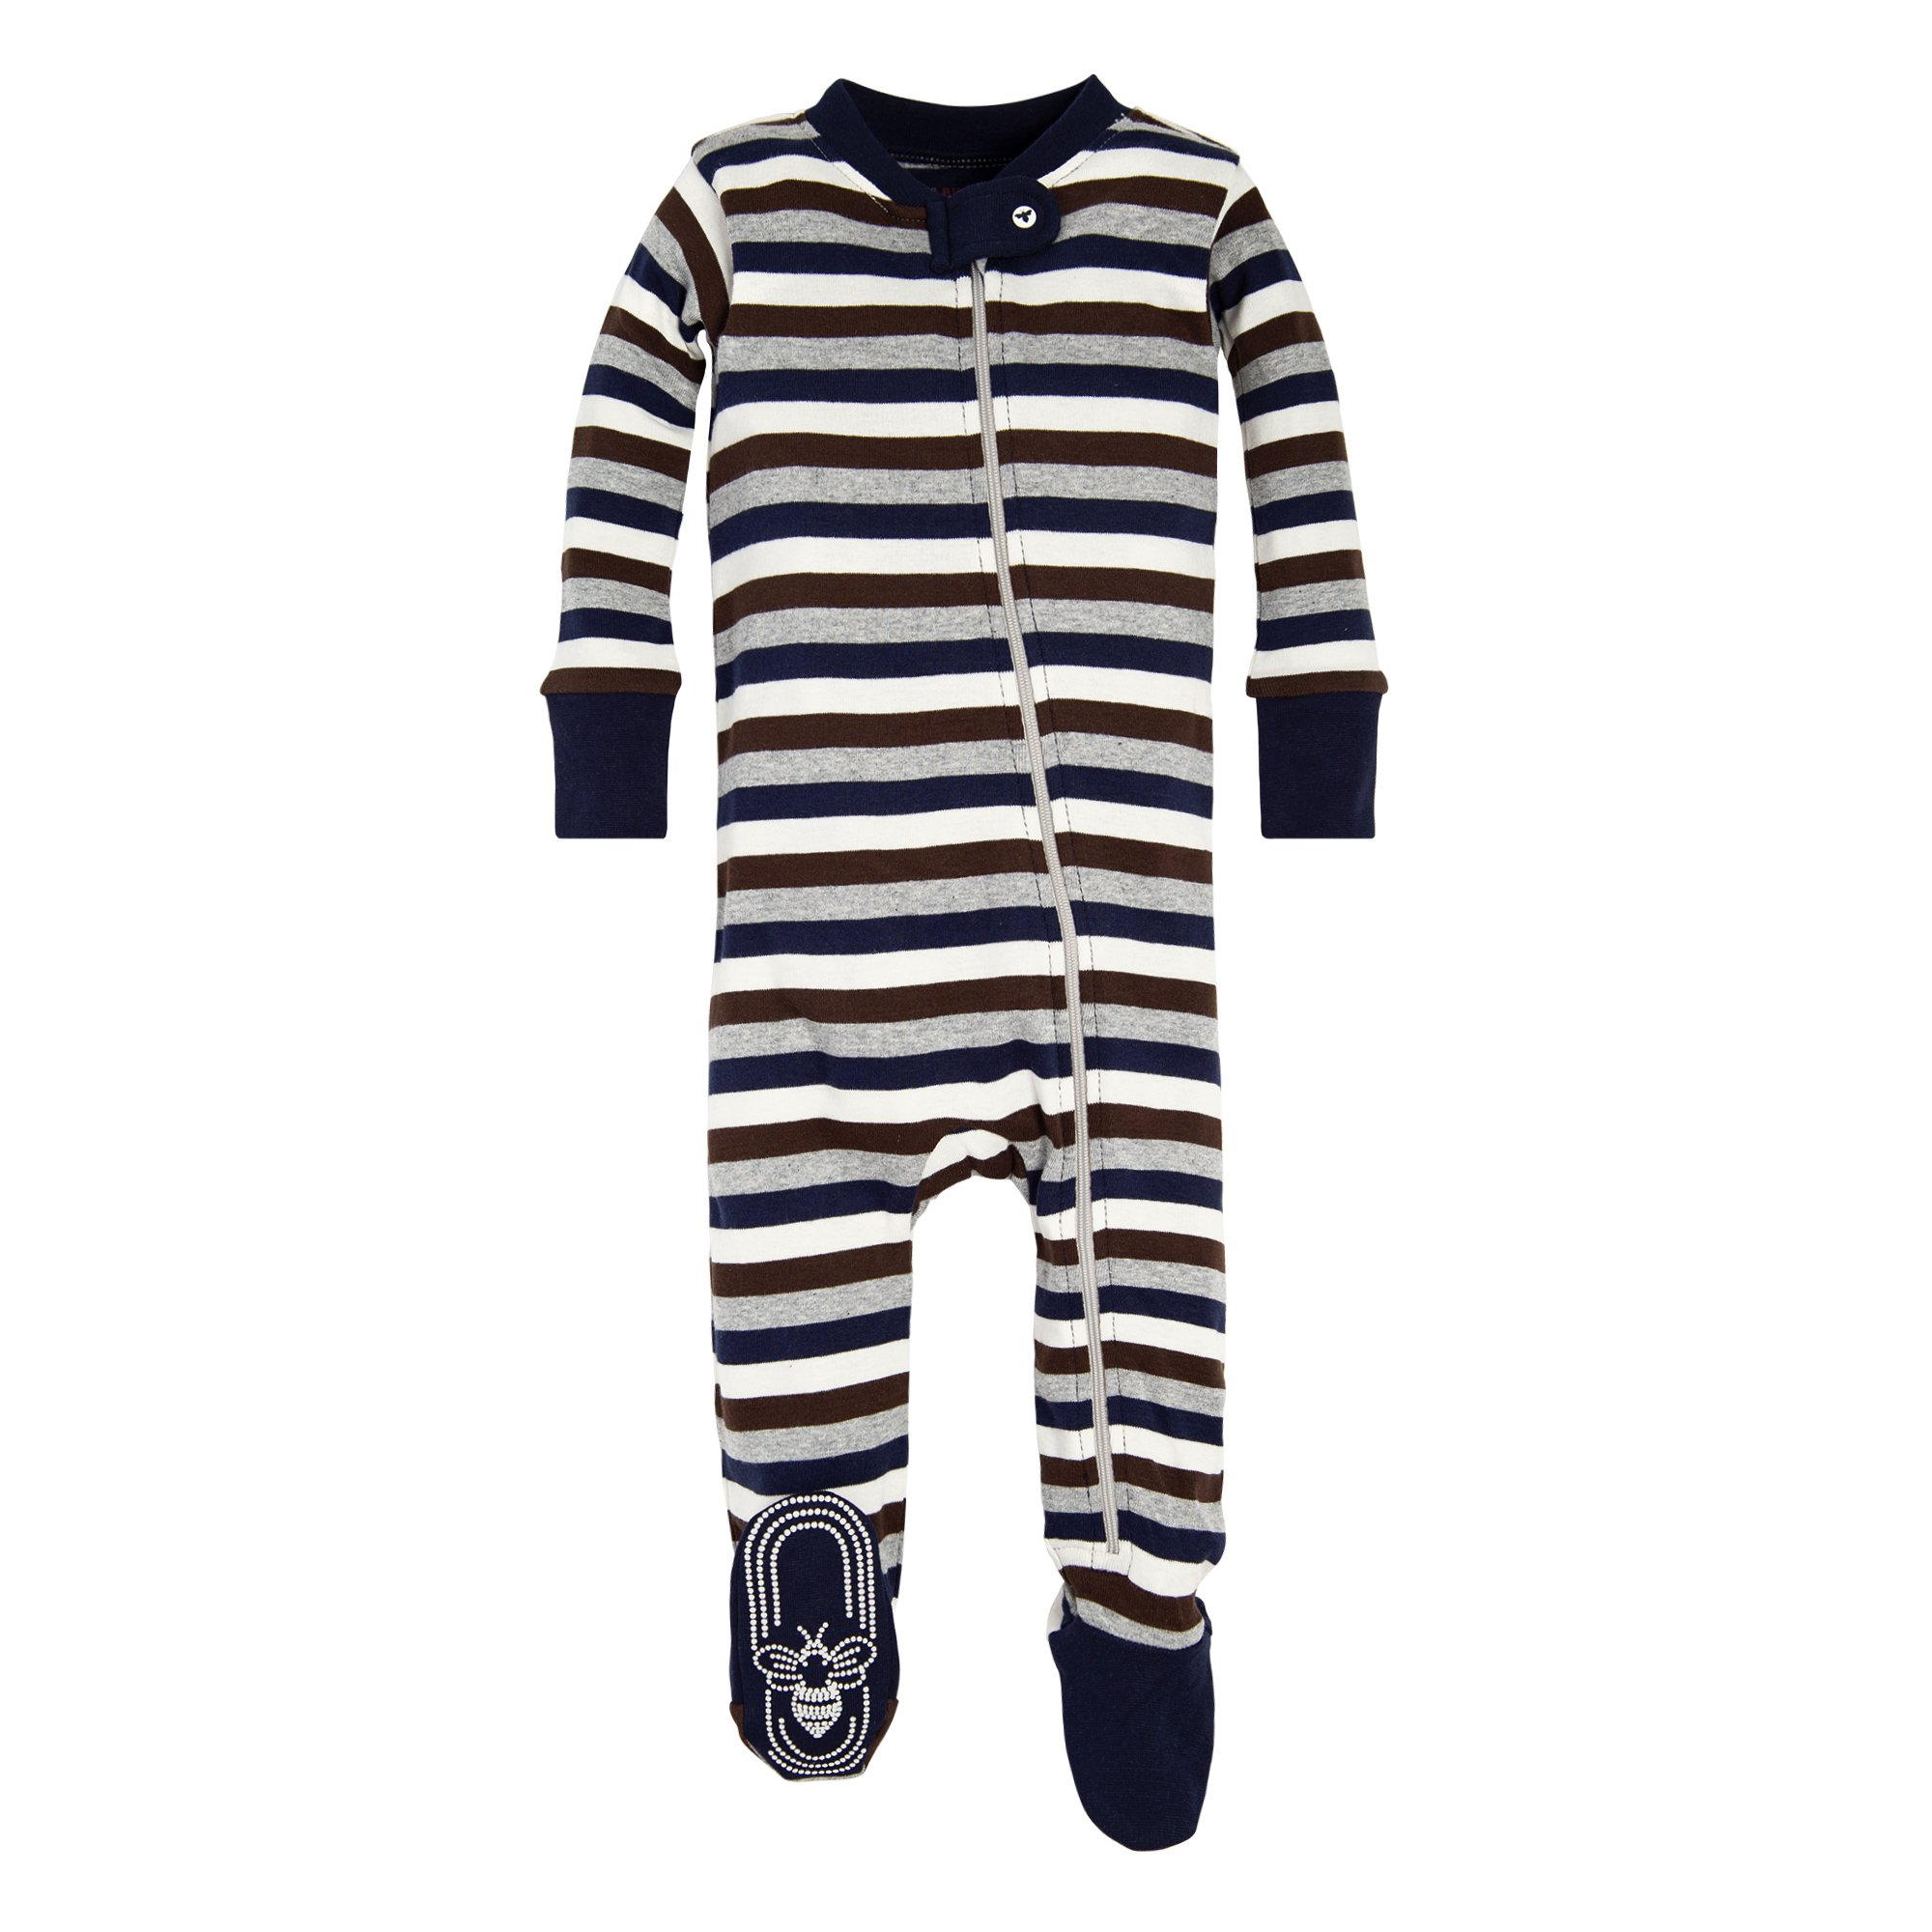 Burt's Bees Baby Baby Boys' Pajamas, Zip Front Non-Slip Footed Sleeper Pjs, 100% Organic Cotton, Midnight Multi Stripe, 3-6 Months